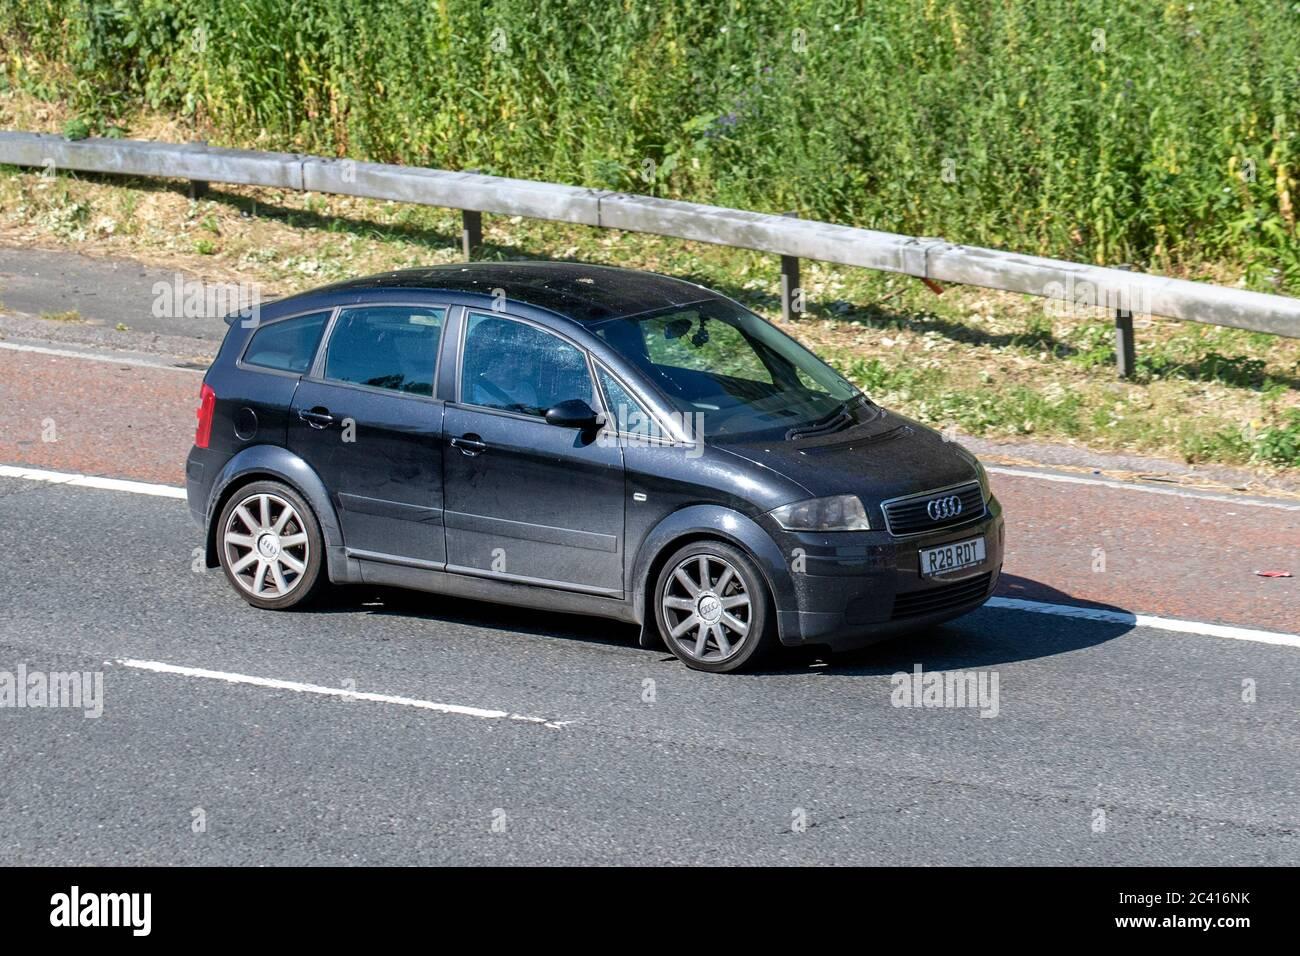 2004 black Audi A2 TDI 90Bhp; Vehicular traffic moving vehicles, cars driving vehicle on UK roads, motors, motoring on the M6 motorway Stock Photo